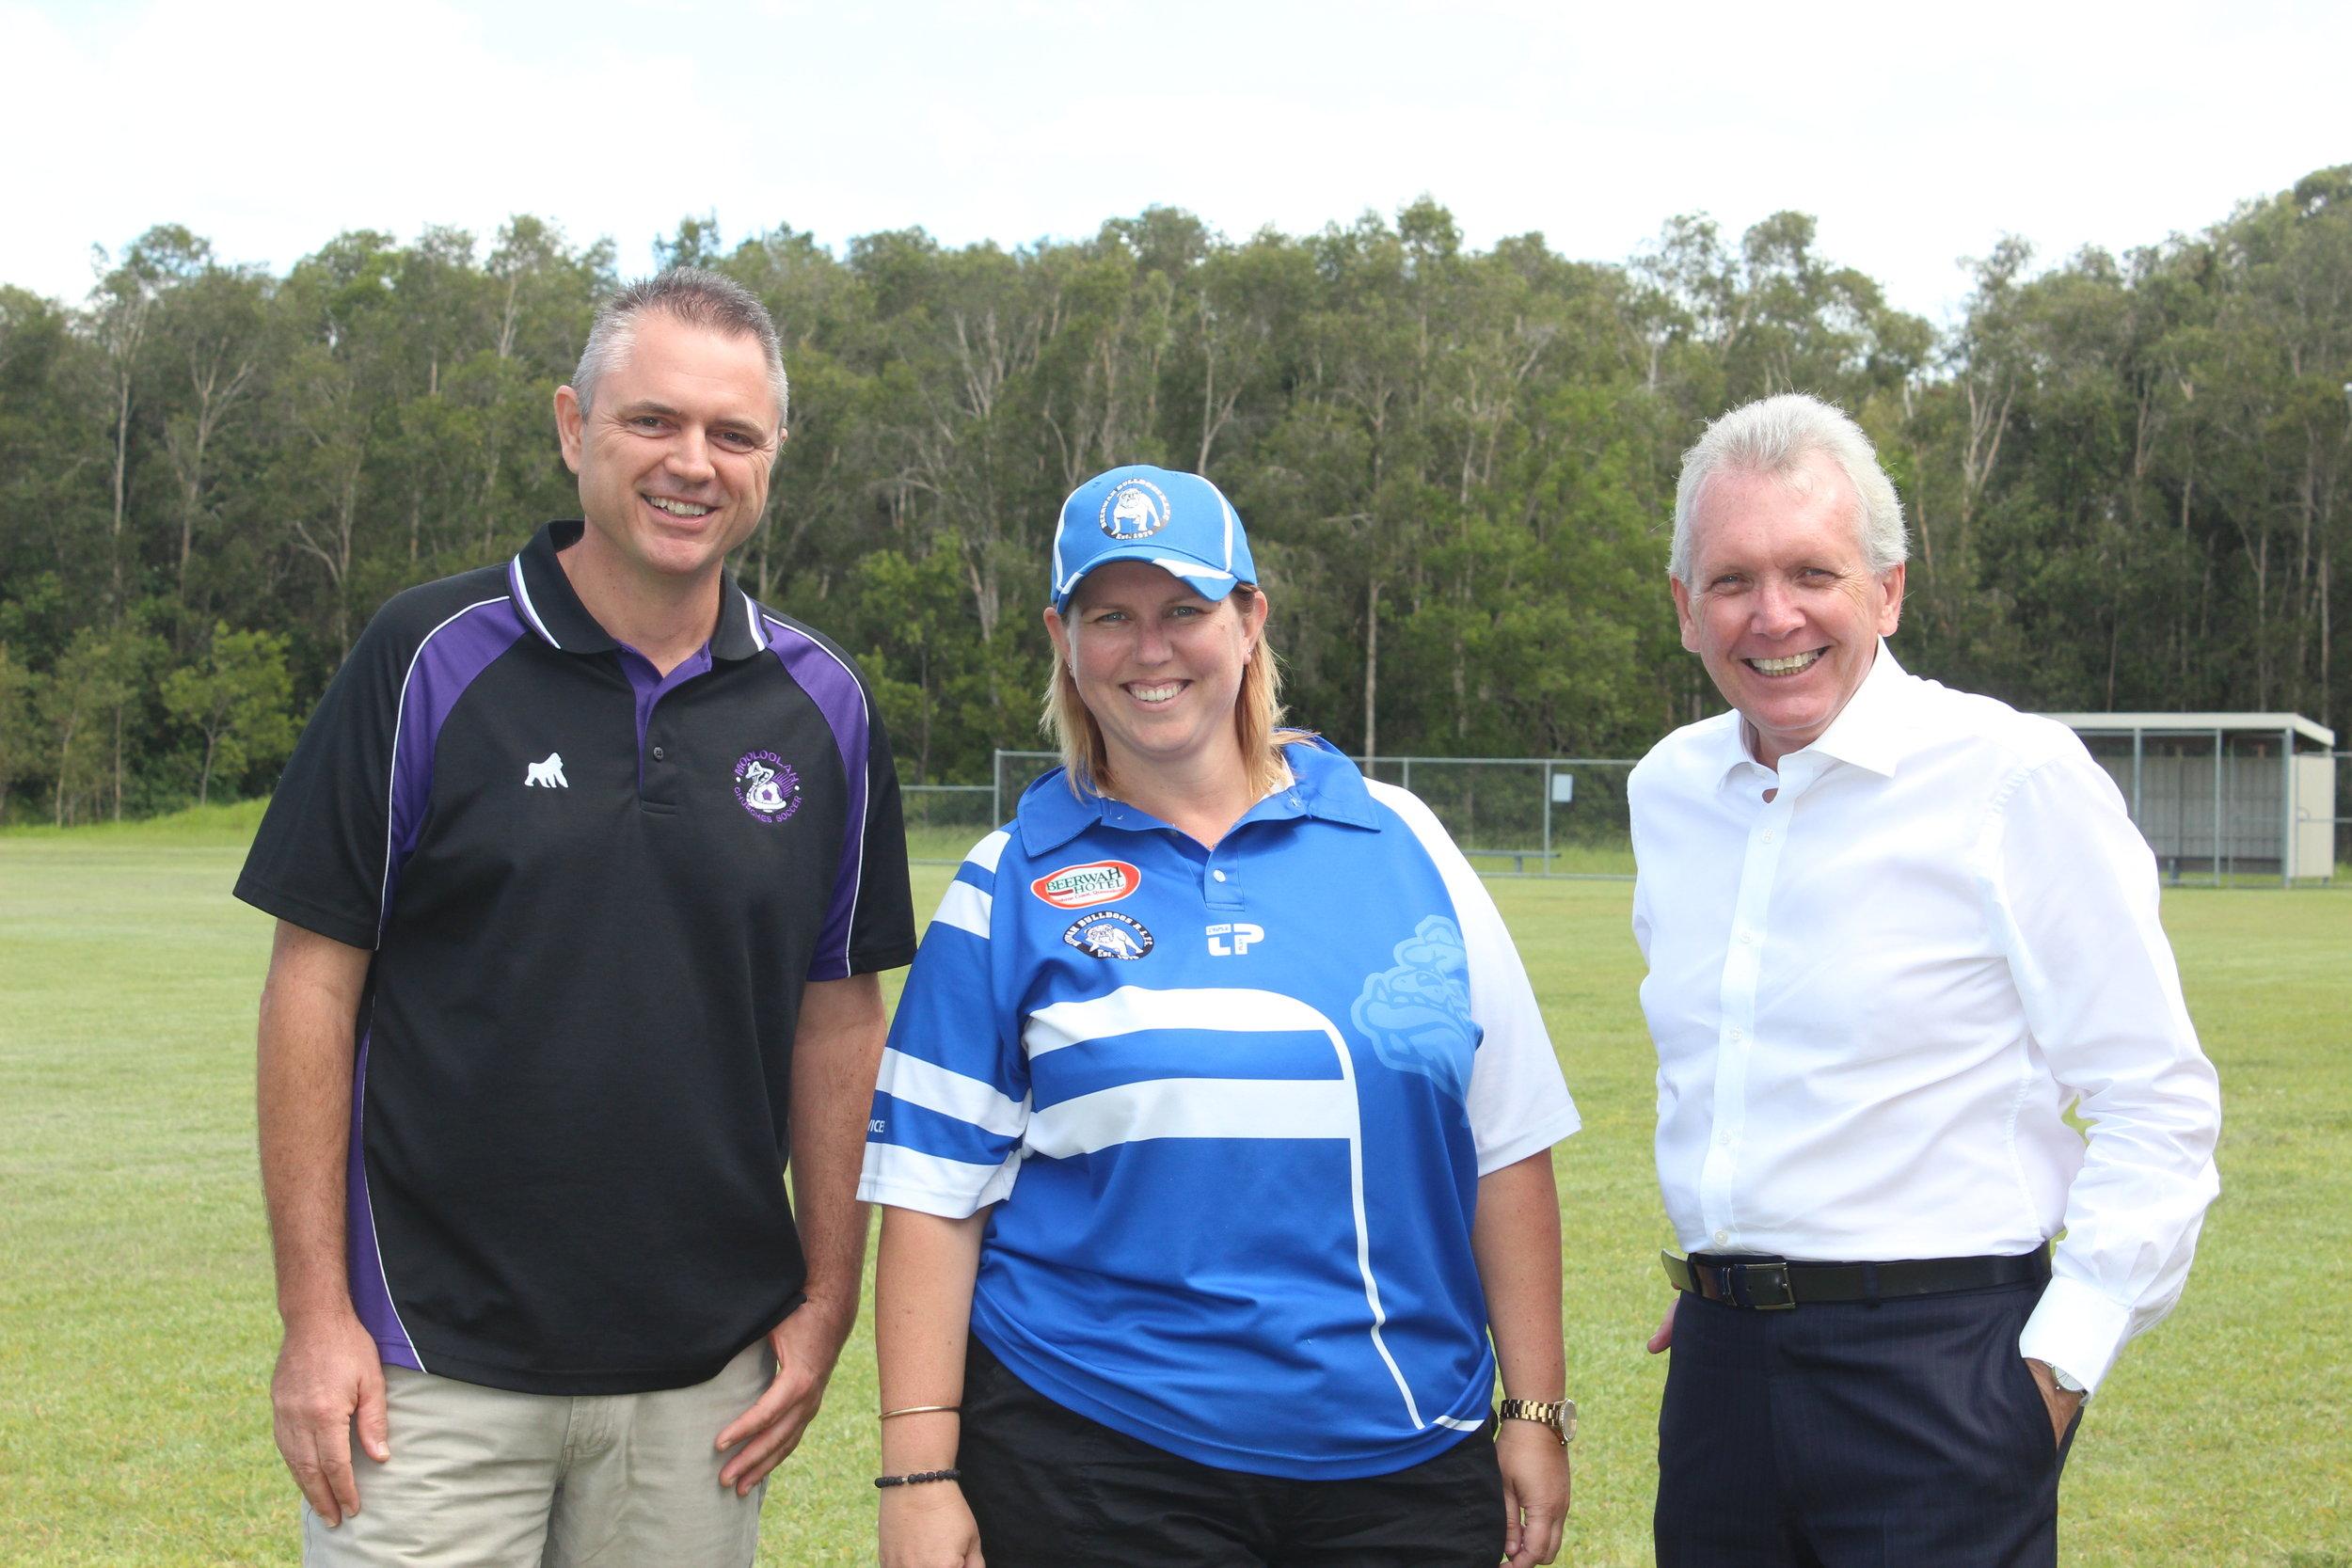 Gus Gillespie (Mooloolah Soccer Club, President), Kylie Bickford (Bulldogs Rugby League Club, Treasurer) with Mark McArdle MP.